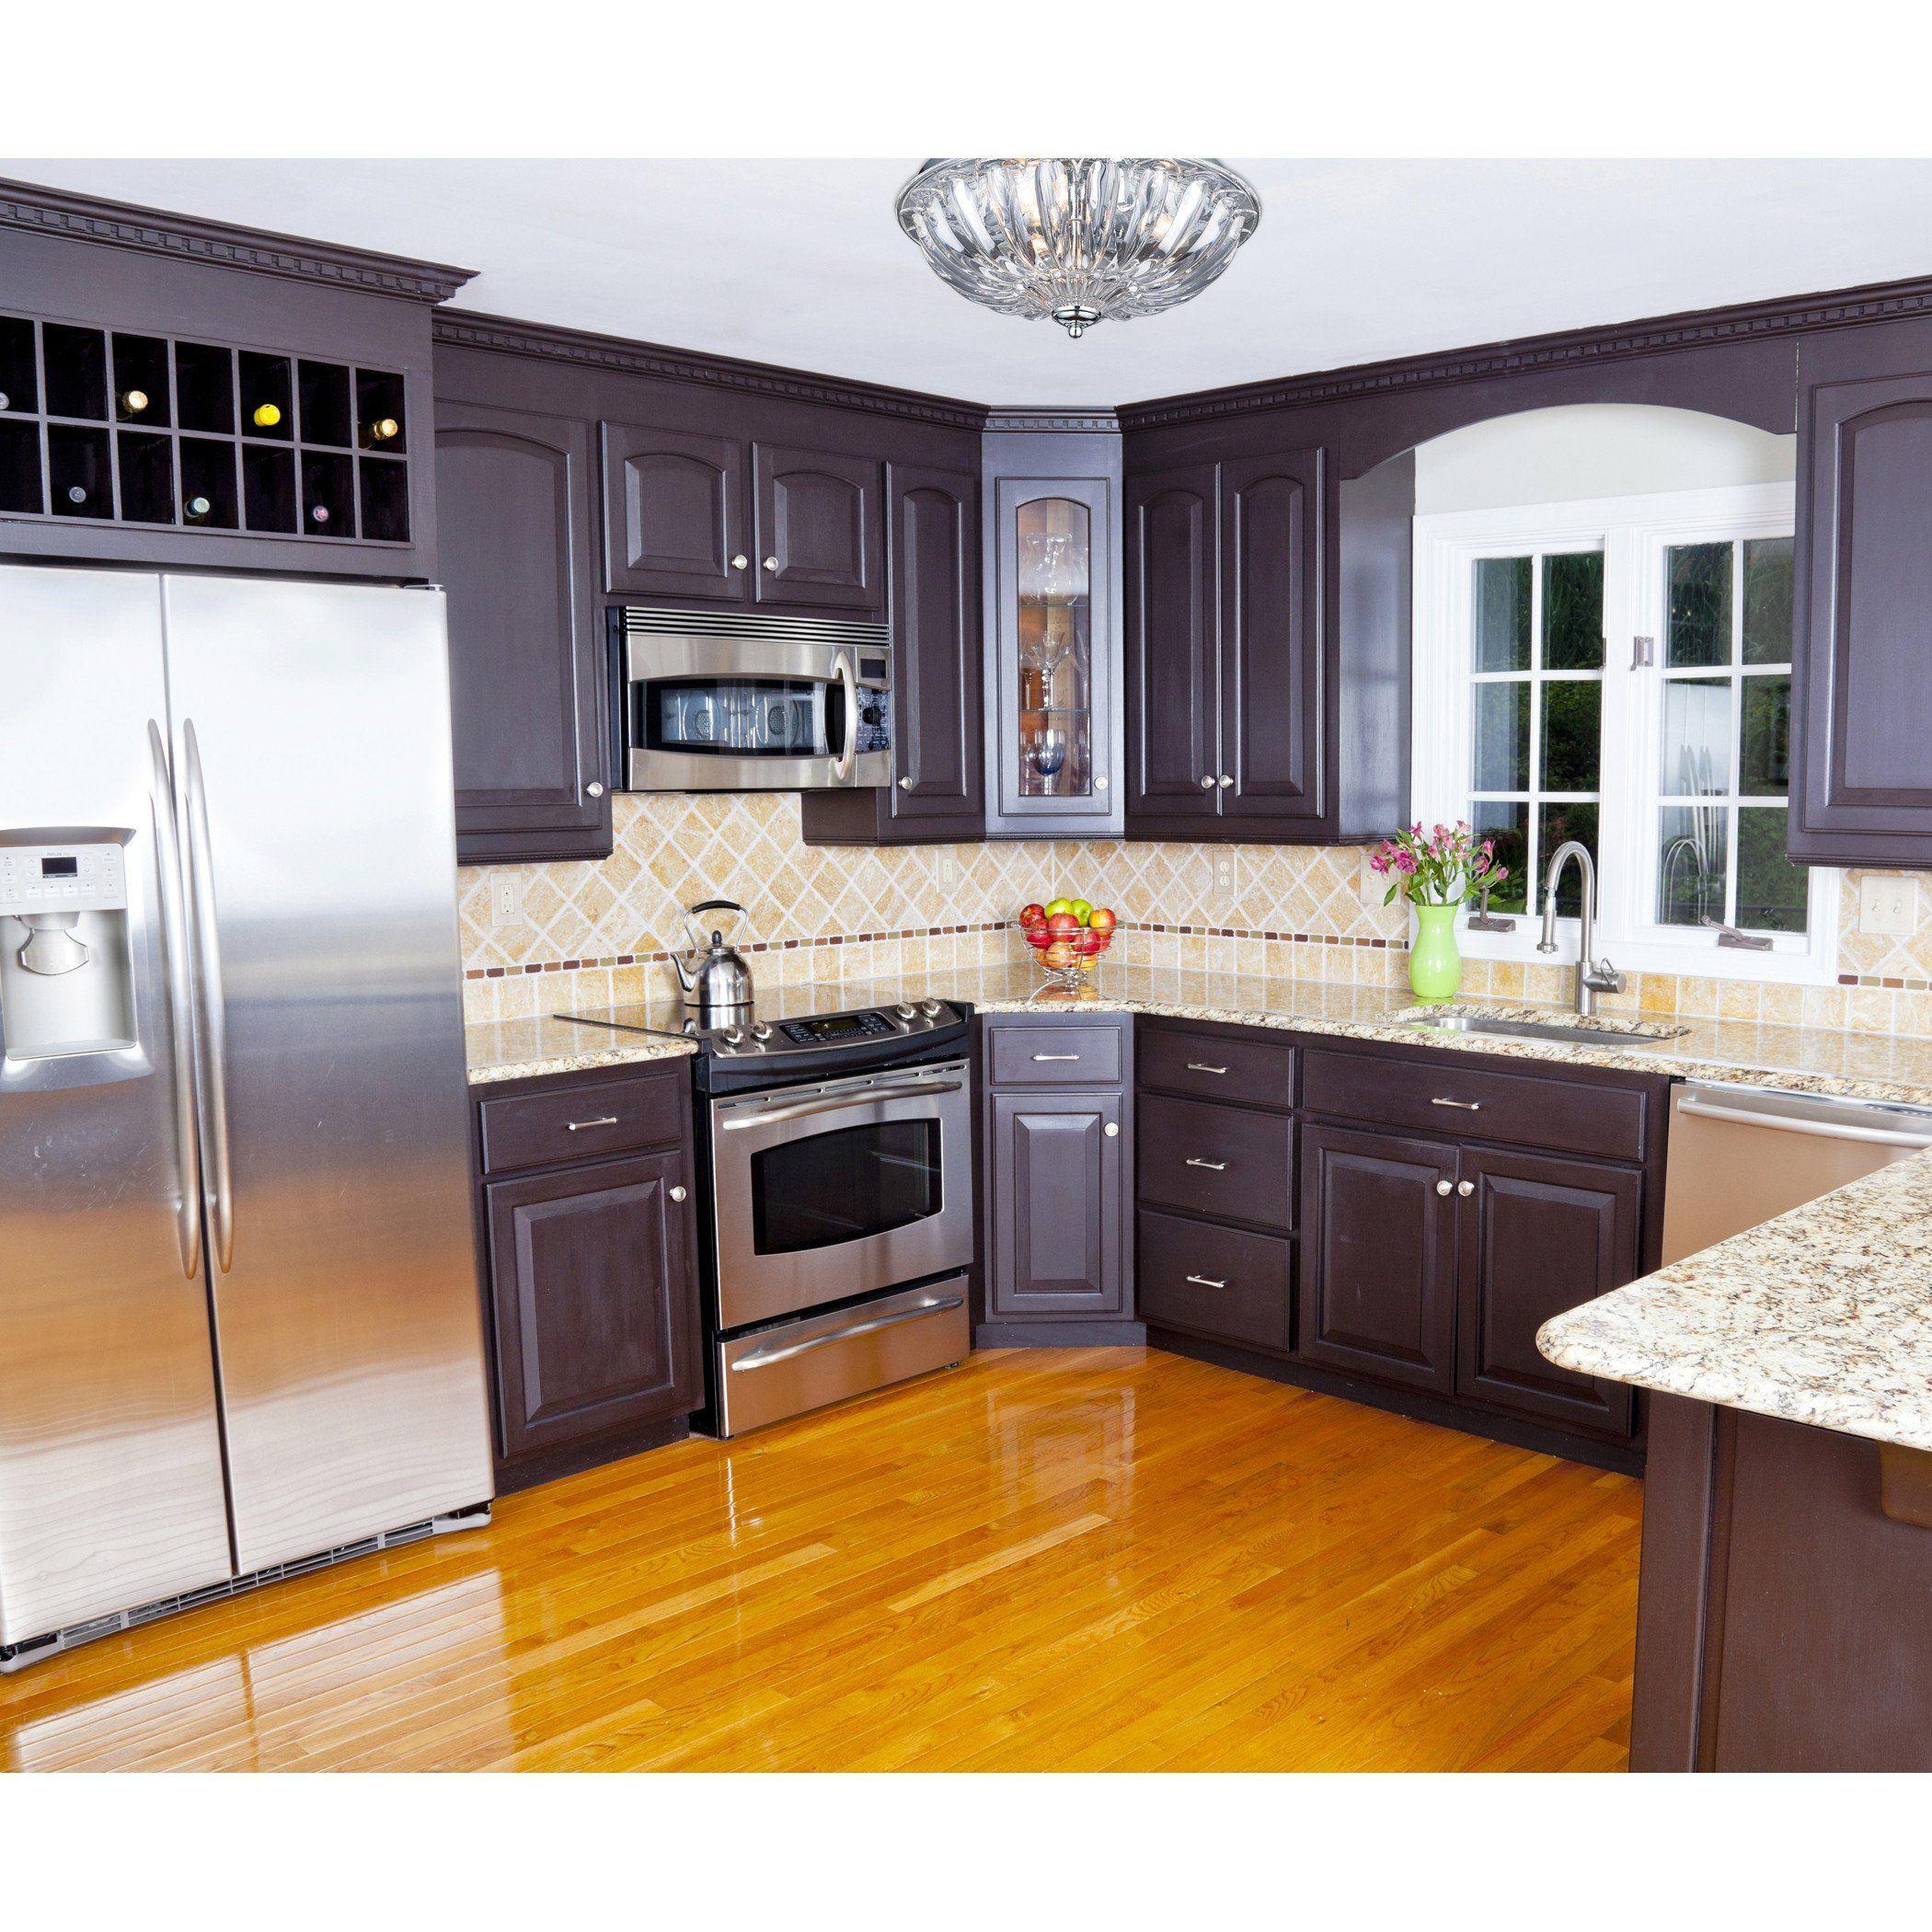 Crystal Flushmounts 2 Light Flushmount In Polished Chrome Modern Kitchen Design Tuscan Kitchen Modern Kitchen Cabinets